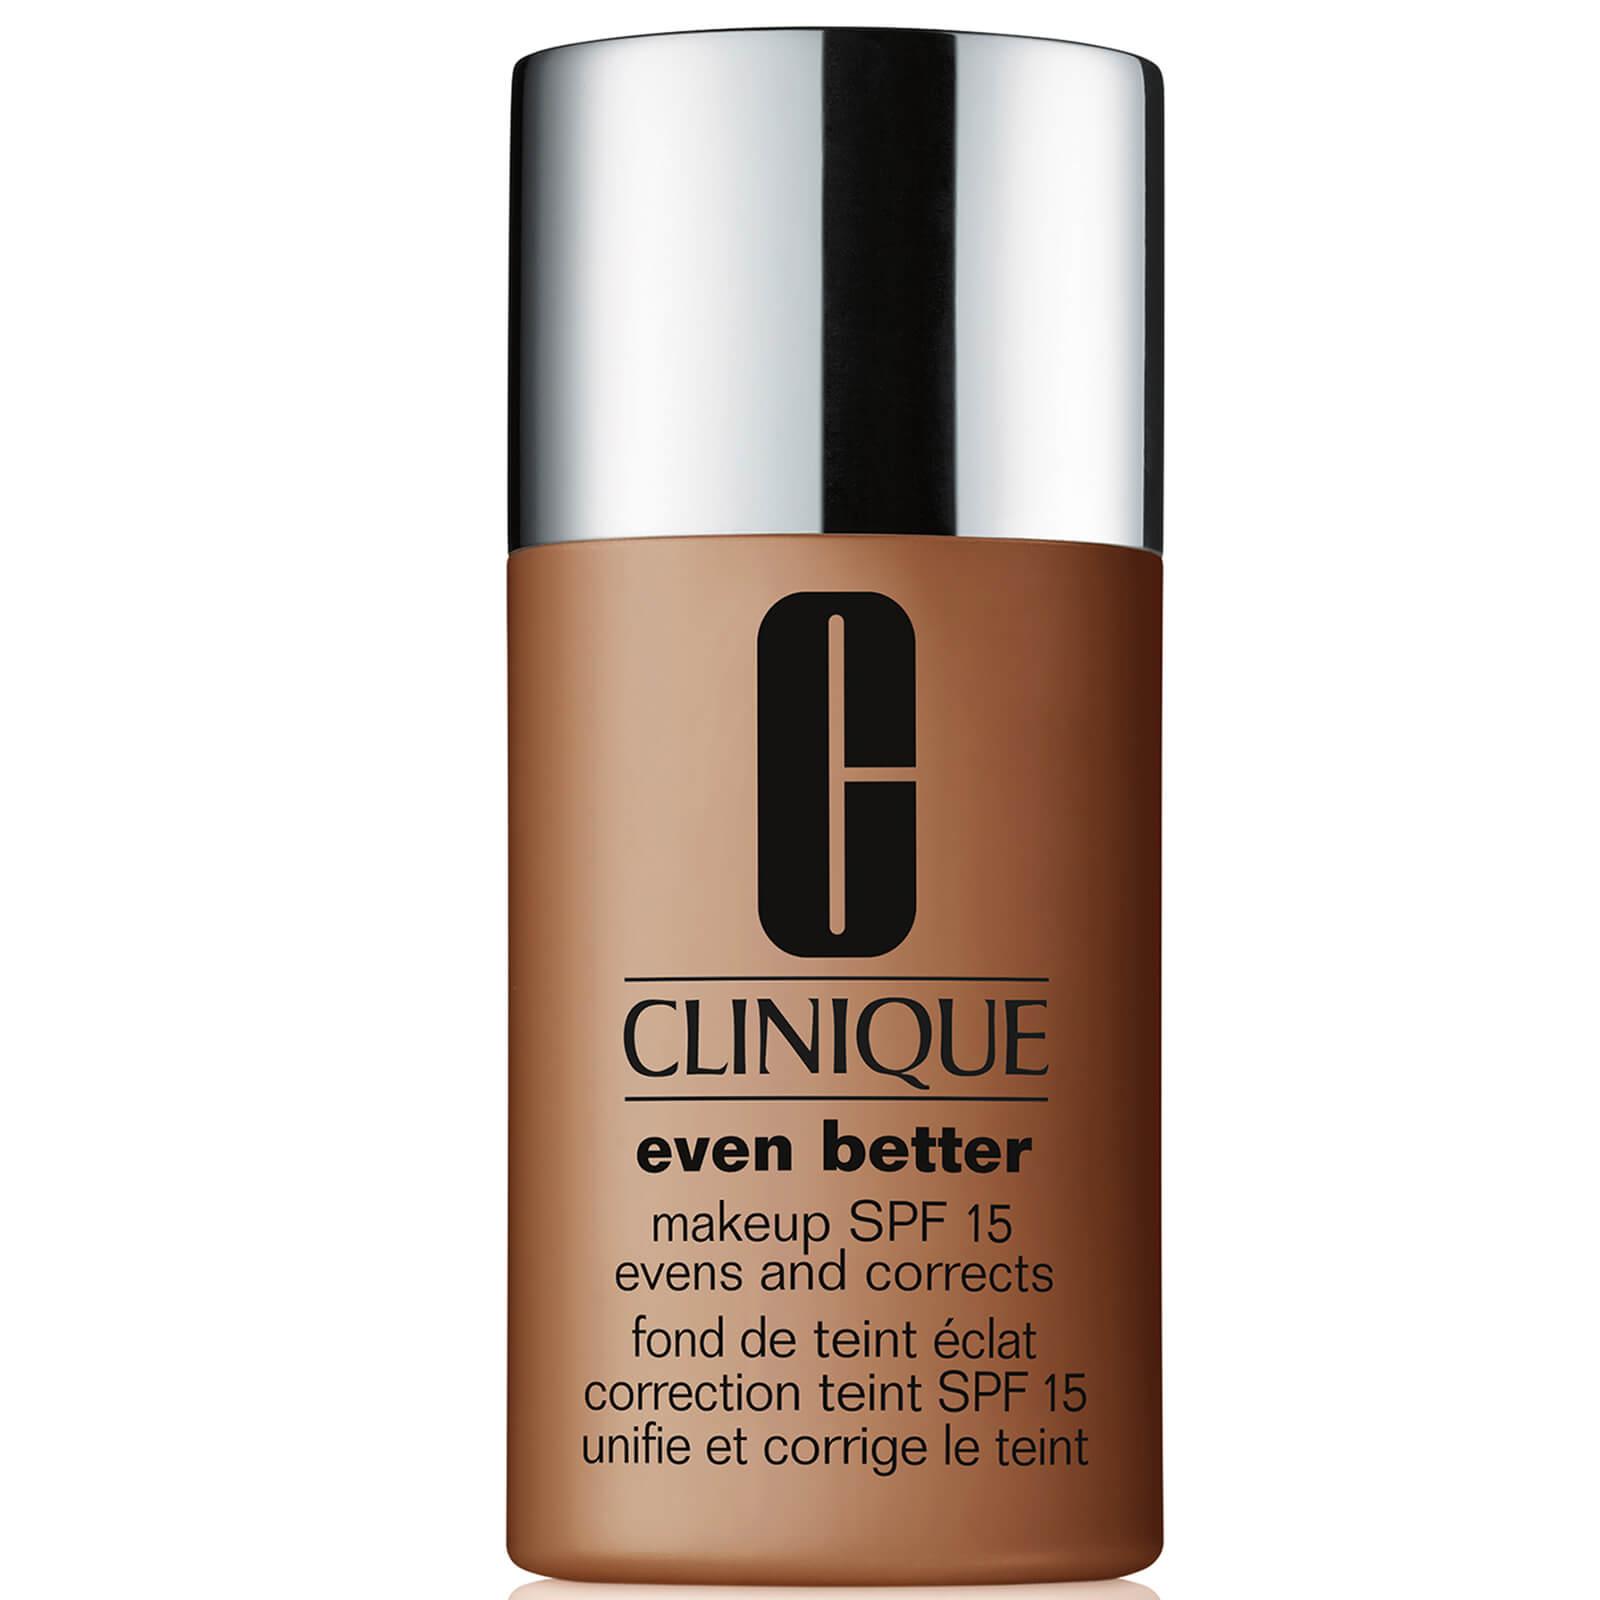 Clinique Even Better Makeup SPF15 30ml (Various Shades) - Sienna